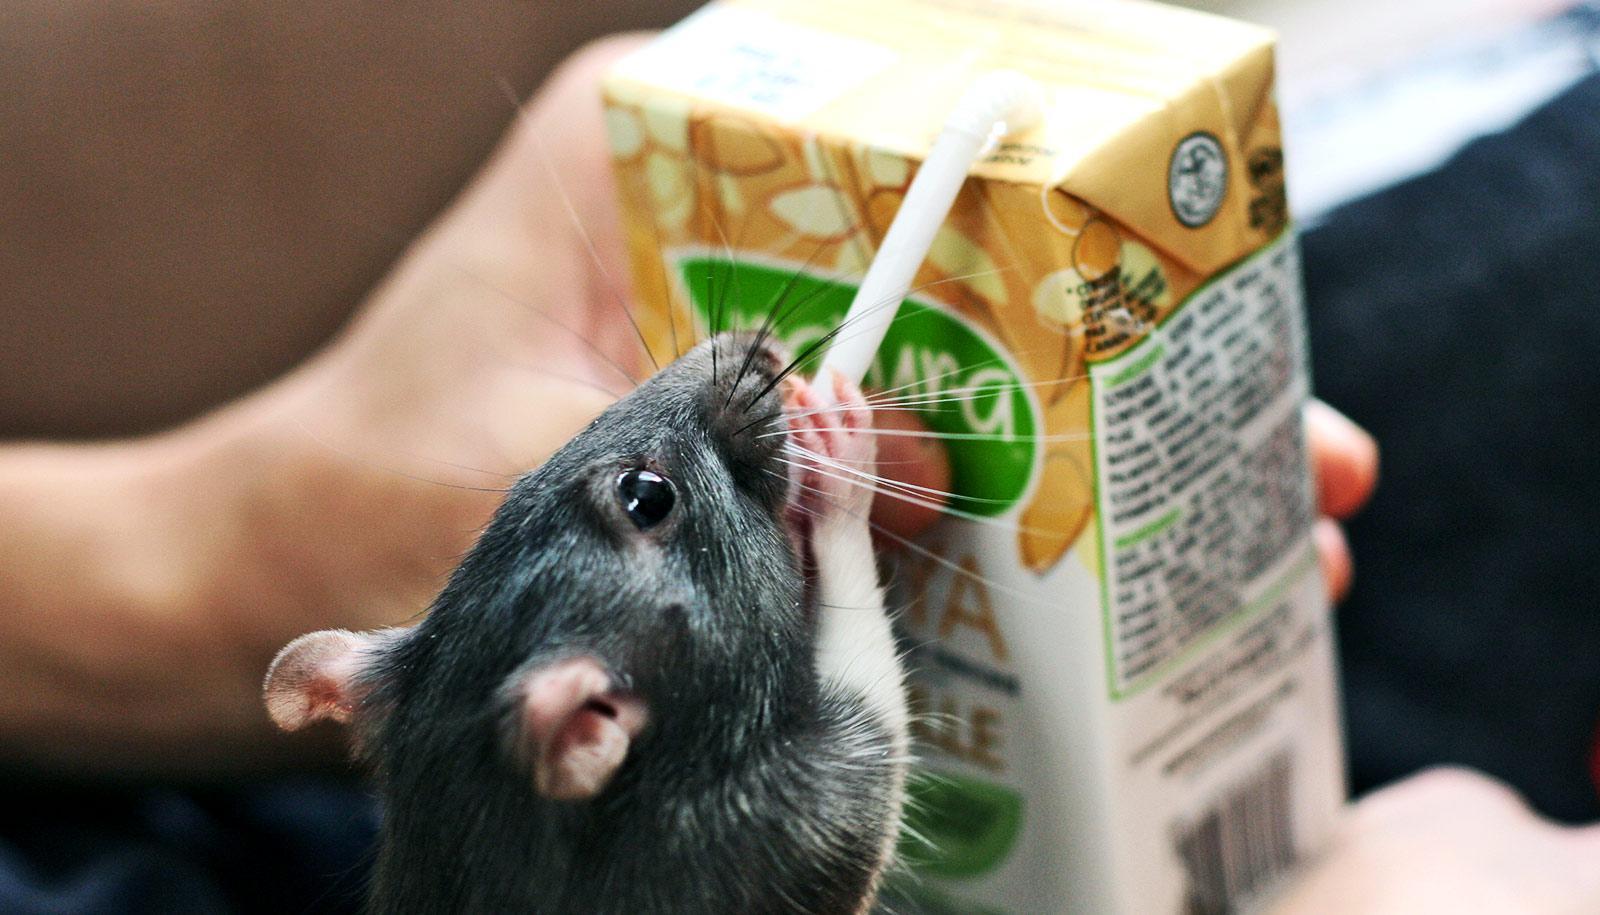 rat drinking from juice box